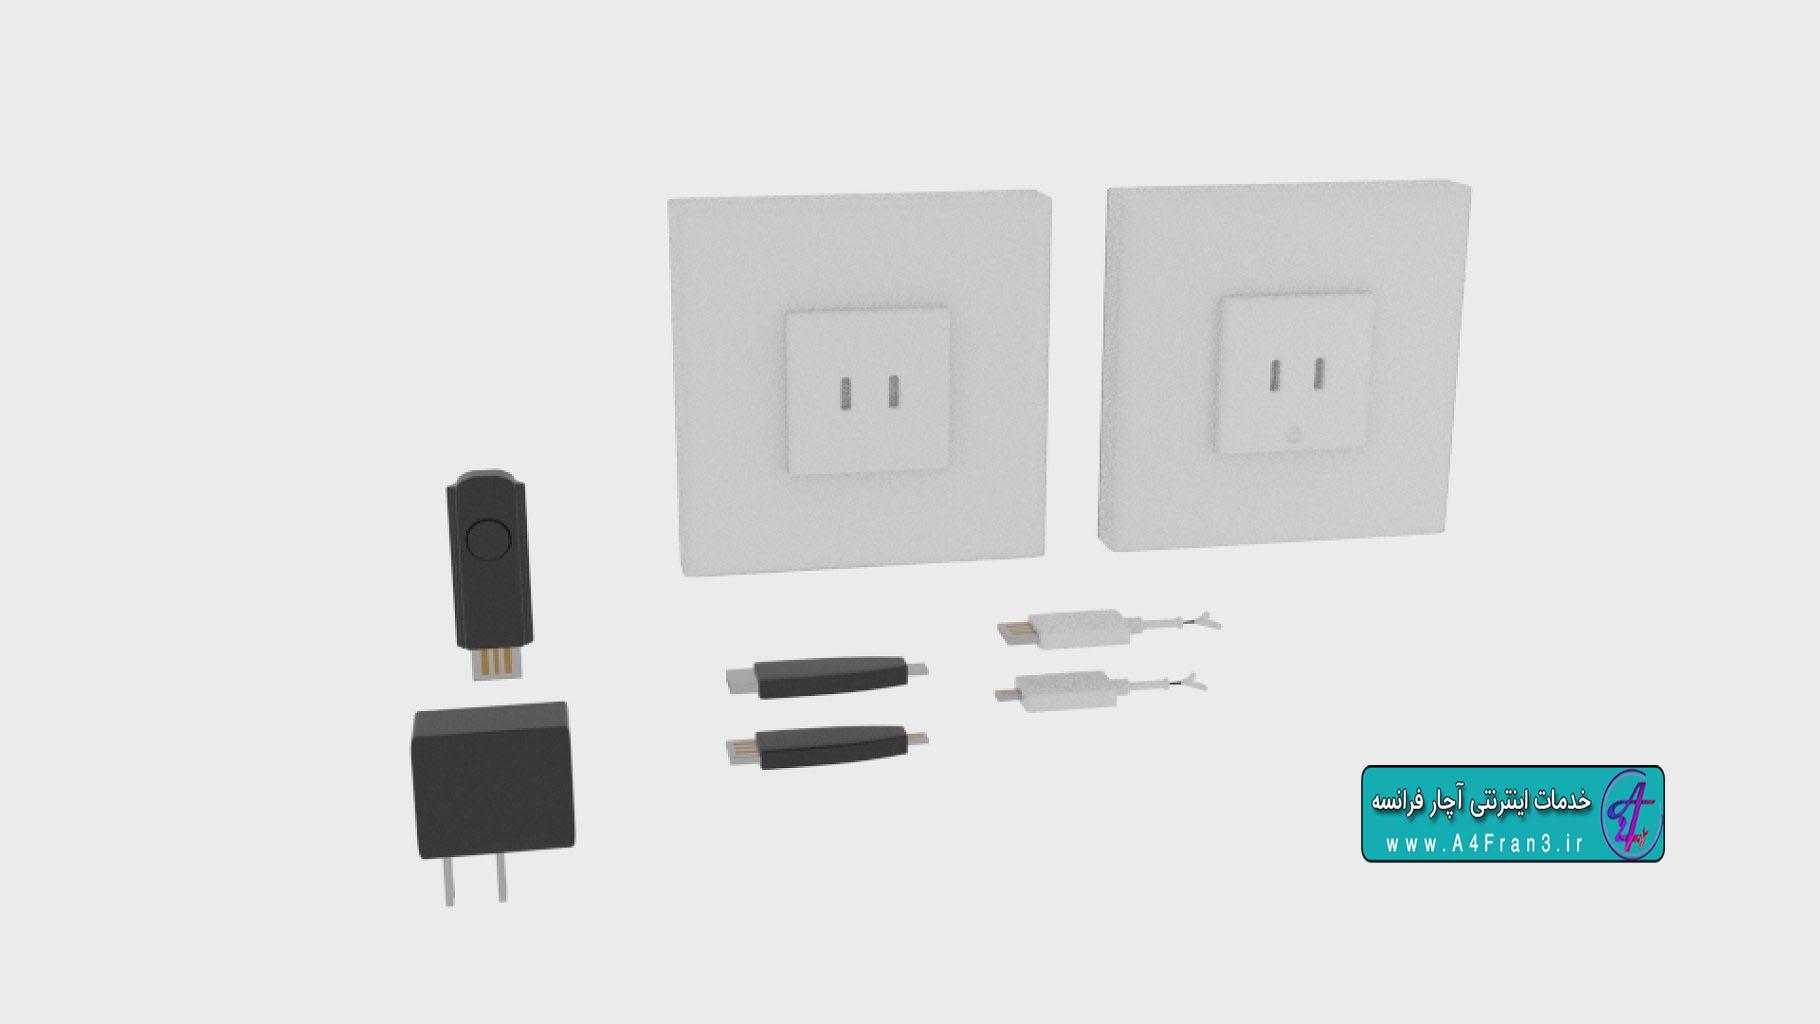 دانلود مدل سه بعدی شارژر یو اس بی USB Charger Component